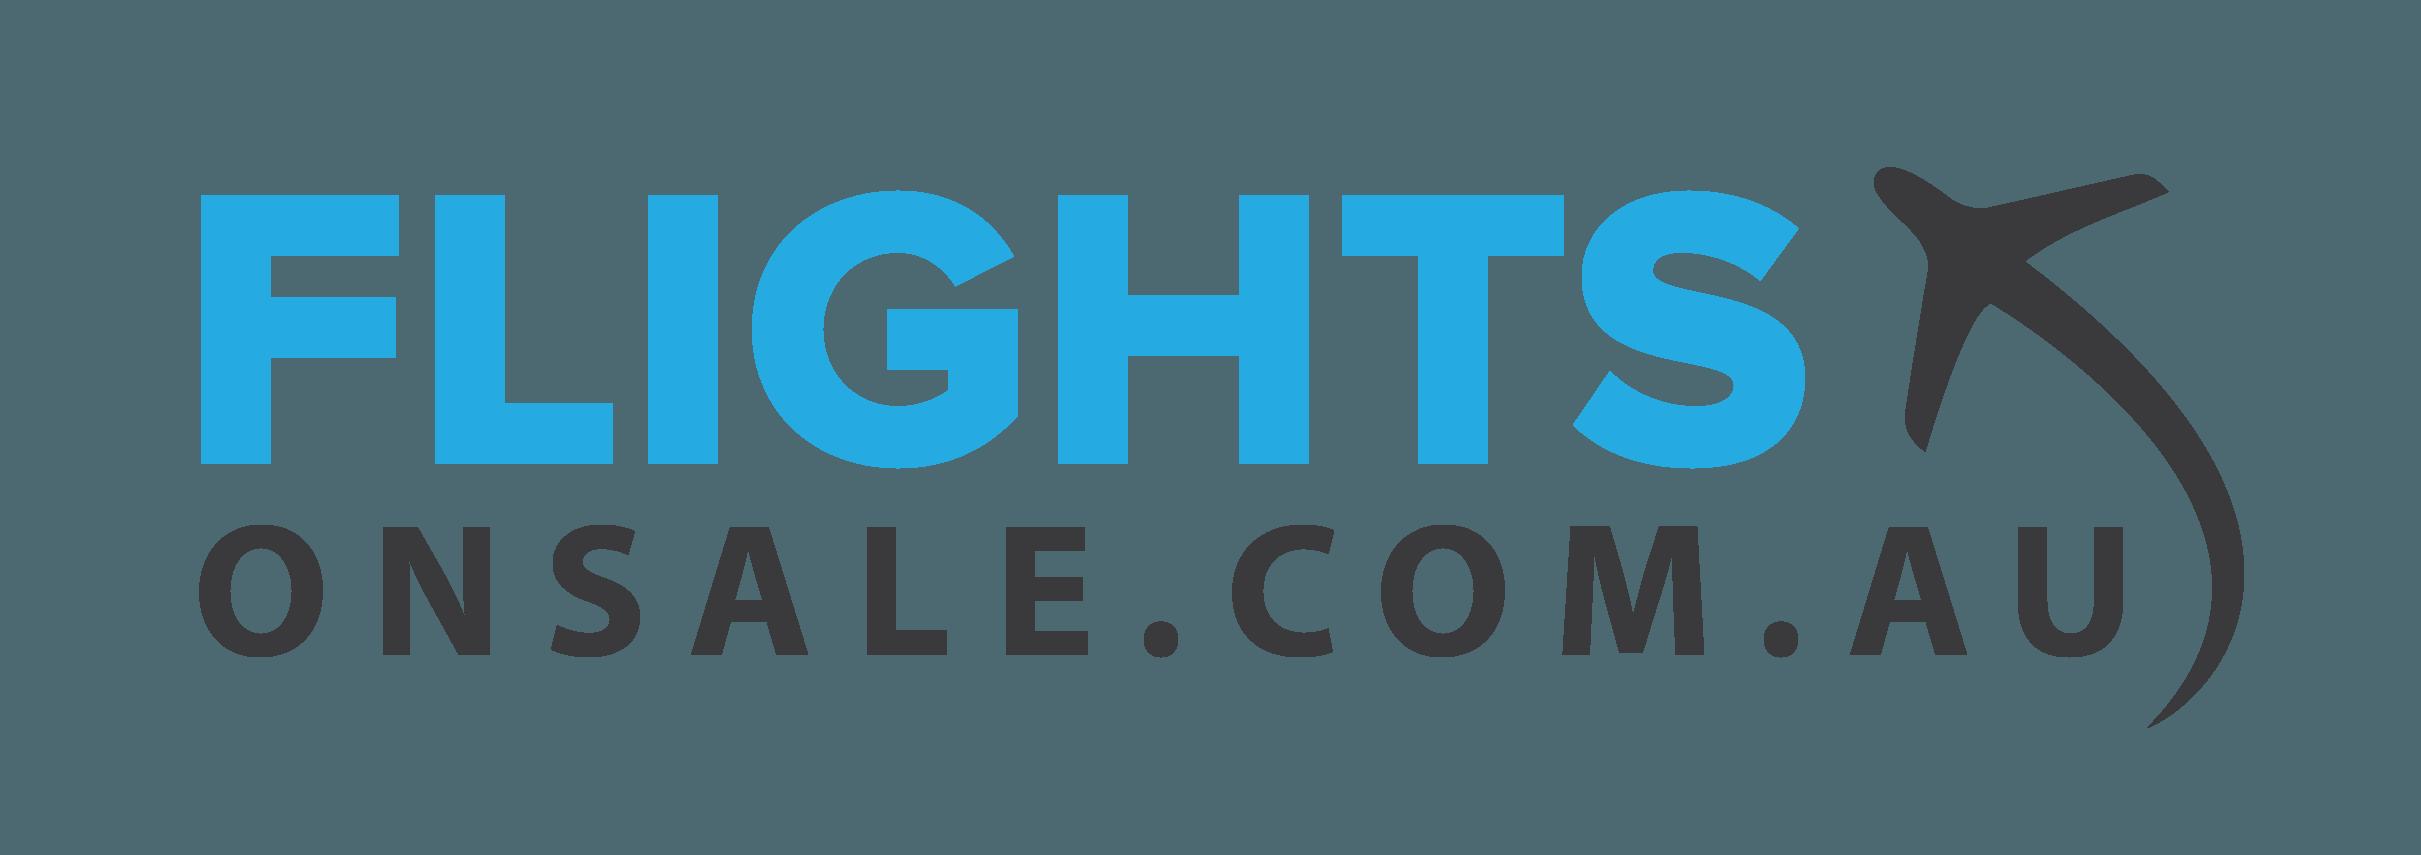 FlightsOnSale.com.au